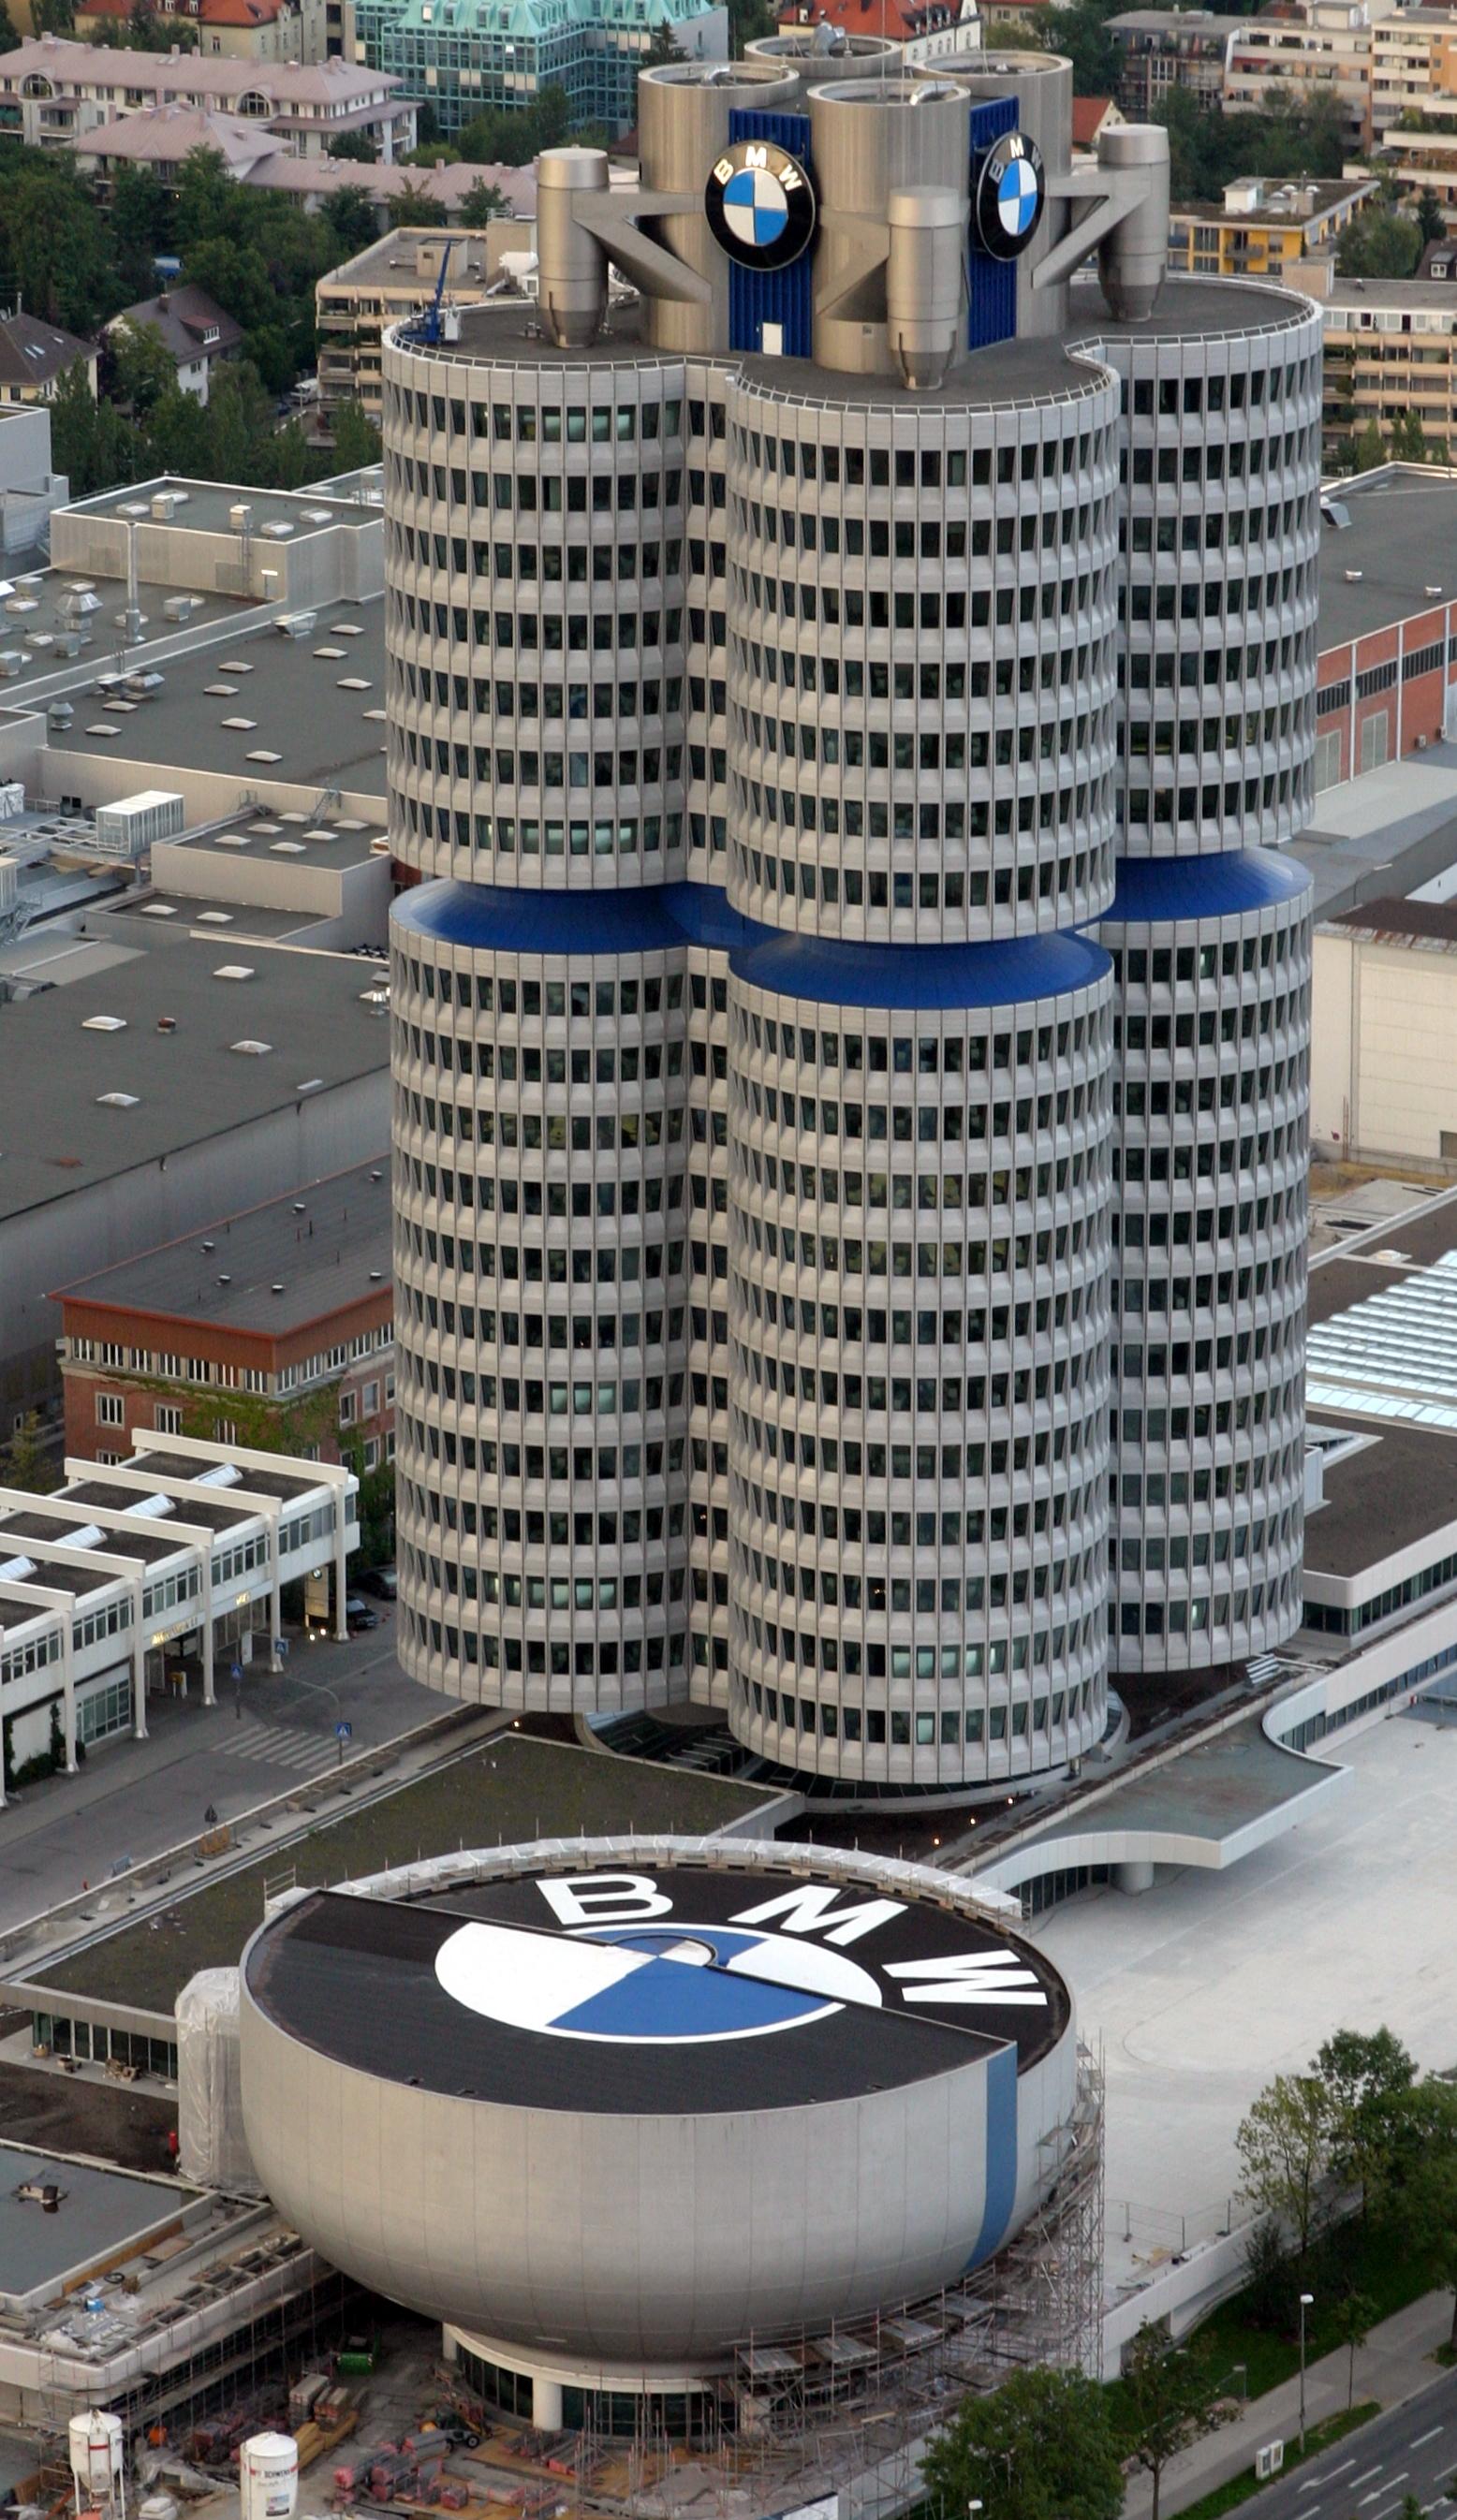 Bmw-hochhaus_1.jpg